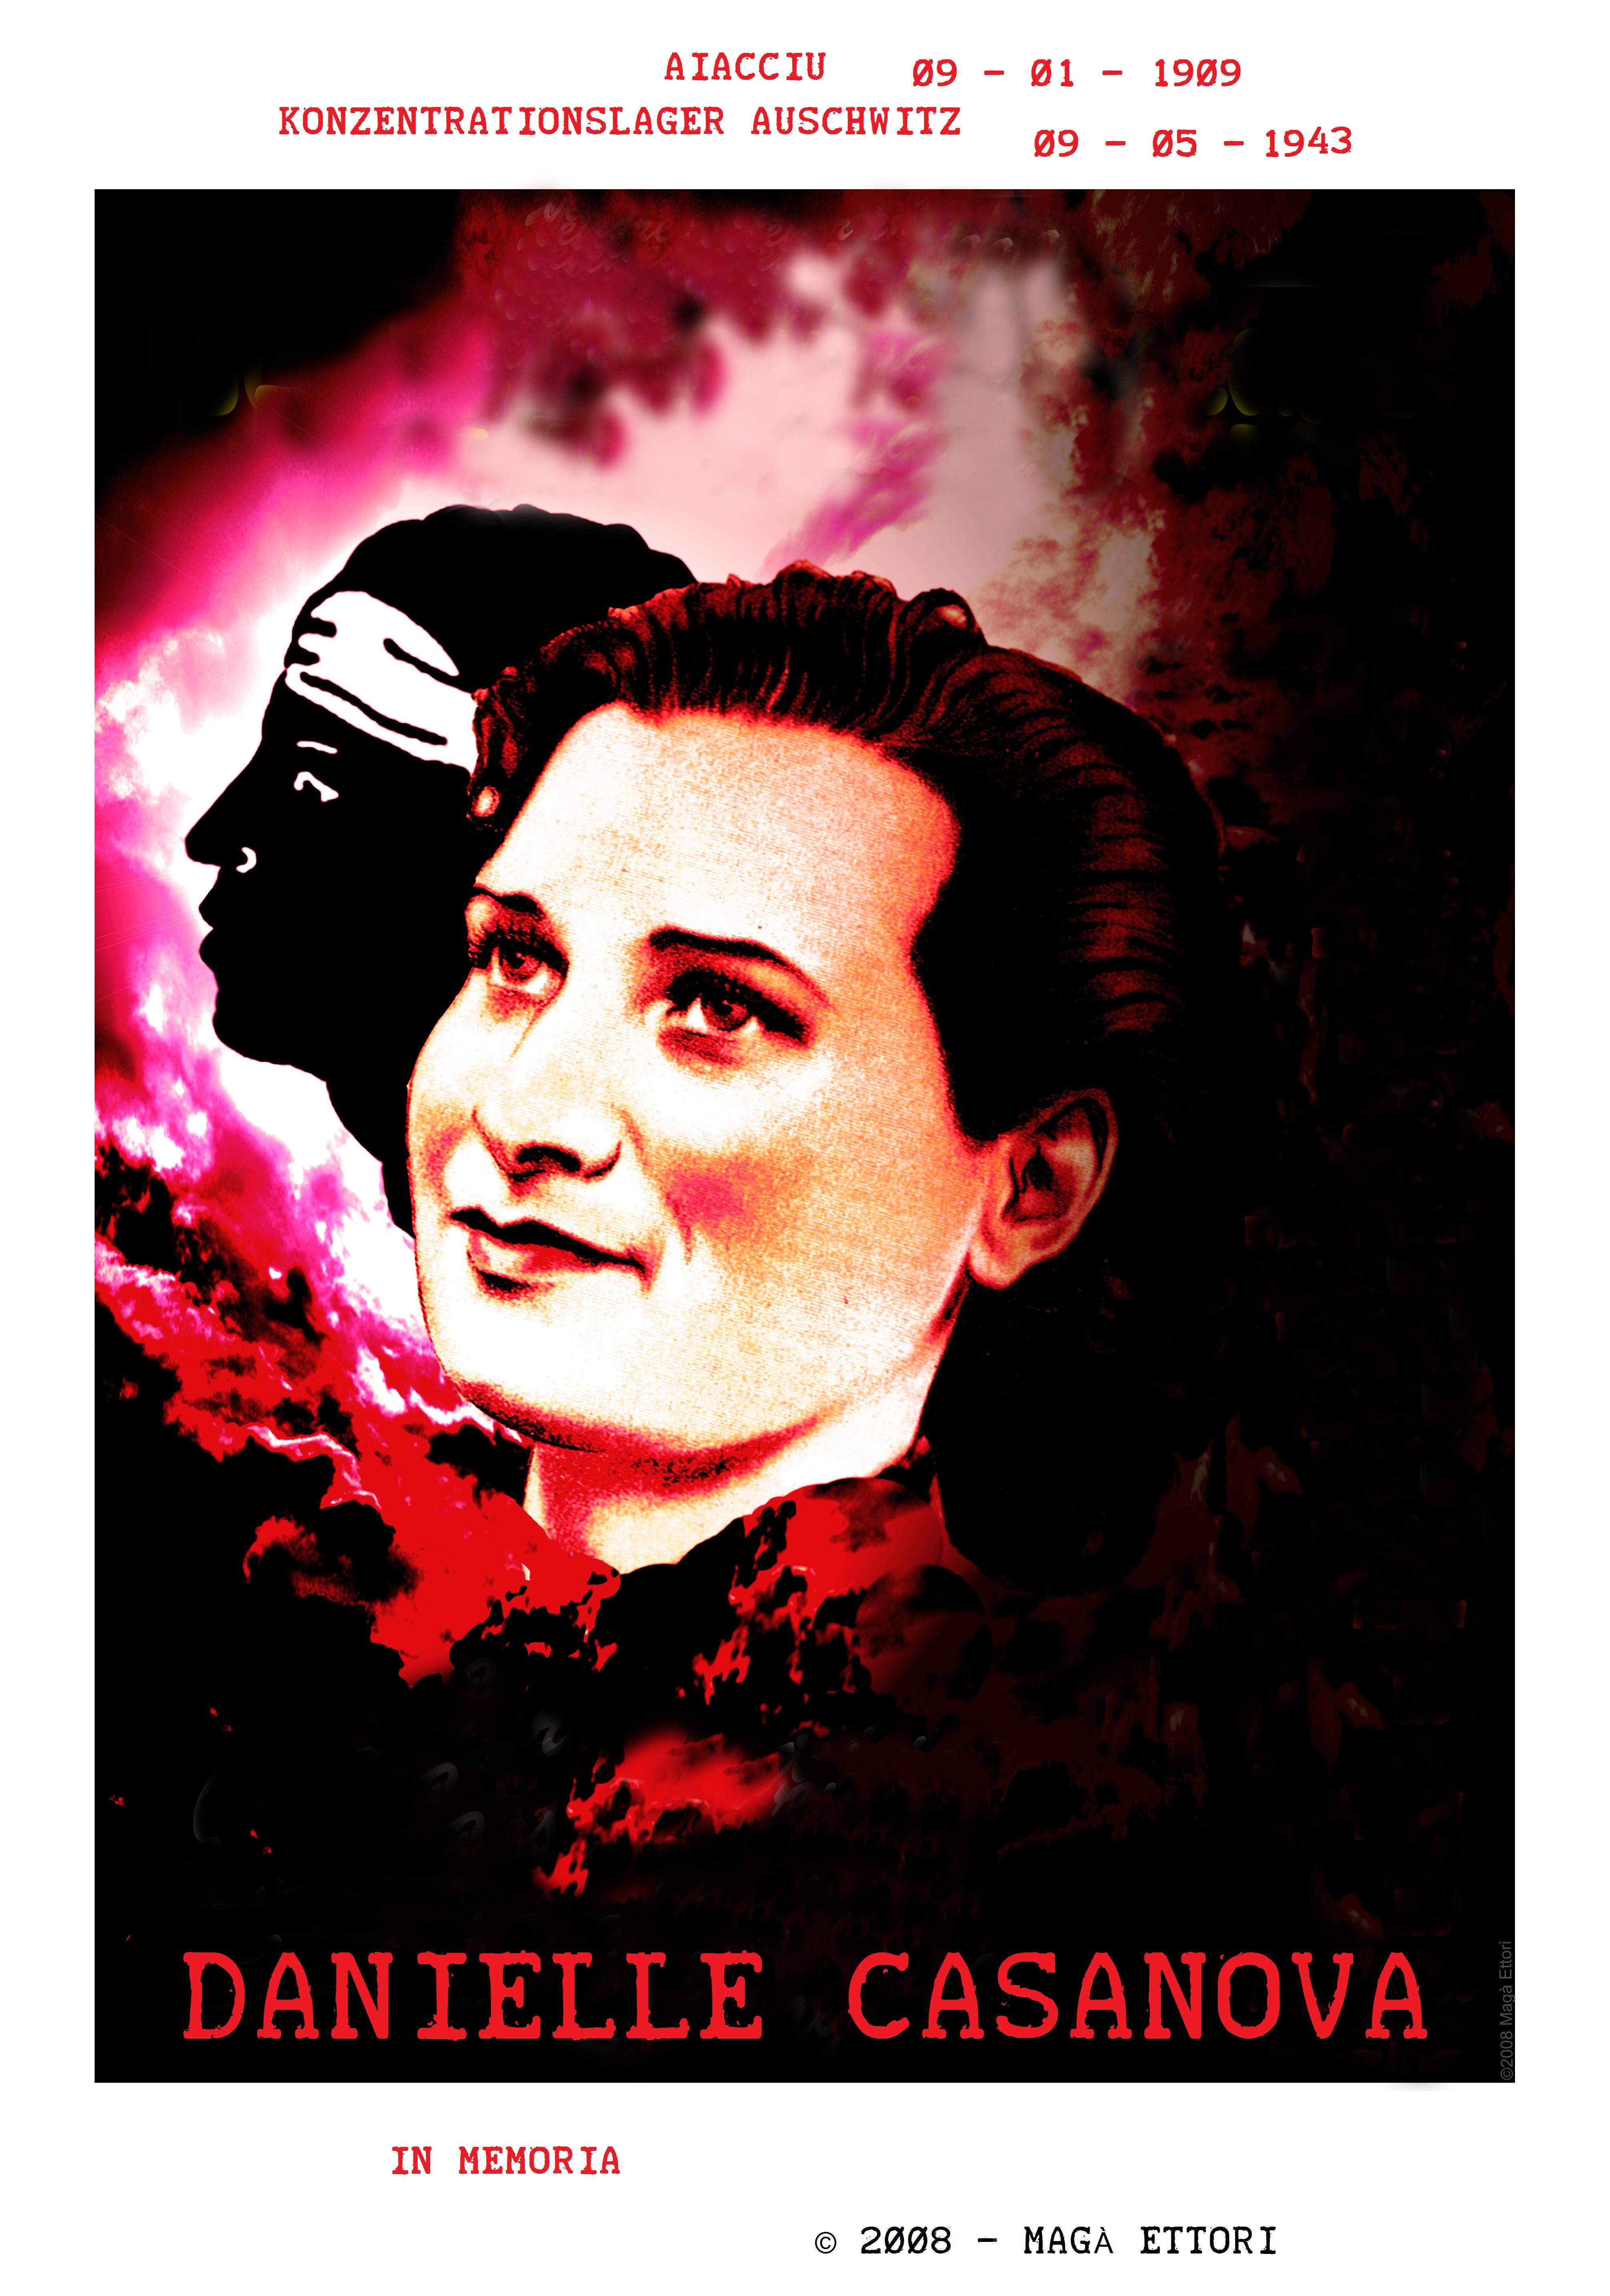 Konzentrationslager Auschwitz 1943 - Danielle Casanova (Magà Ettori)